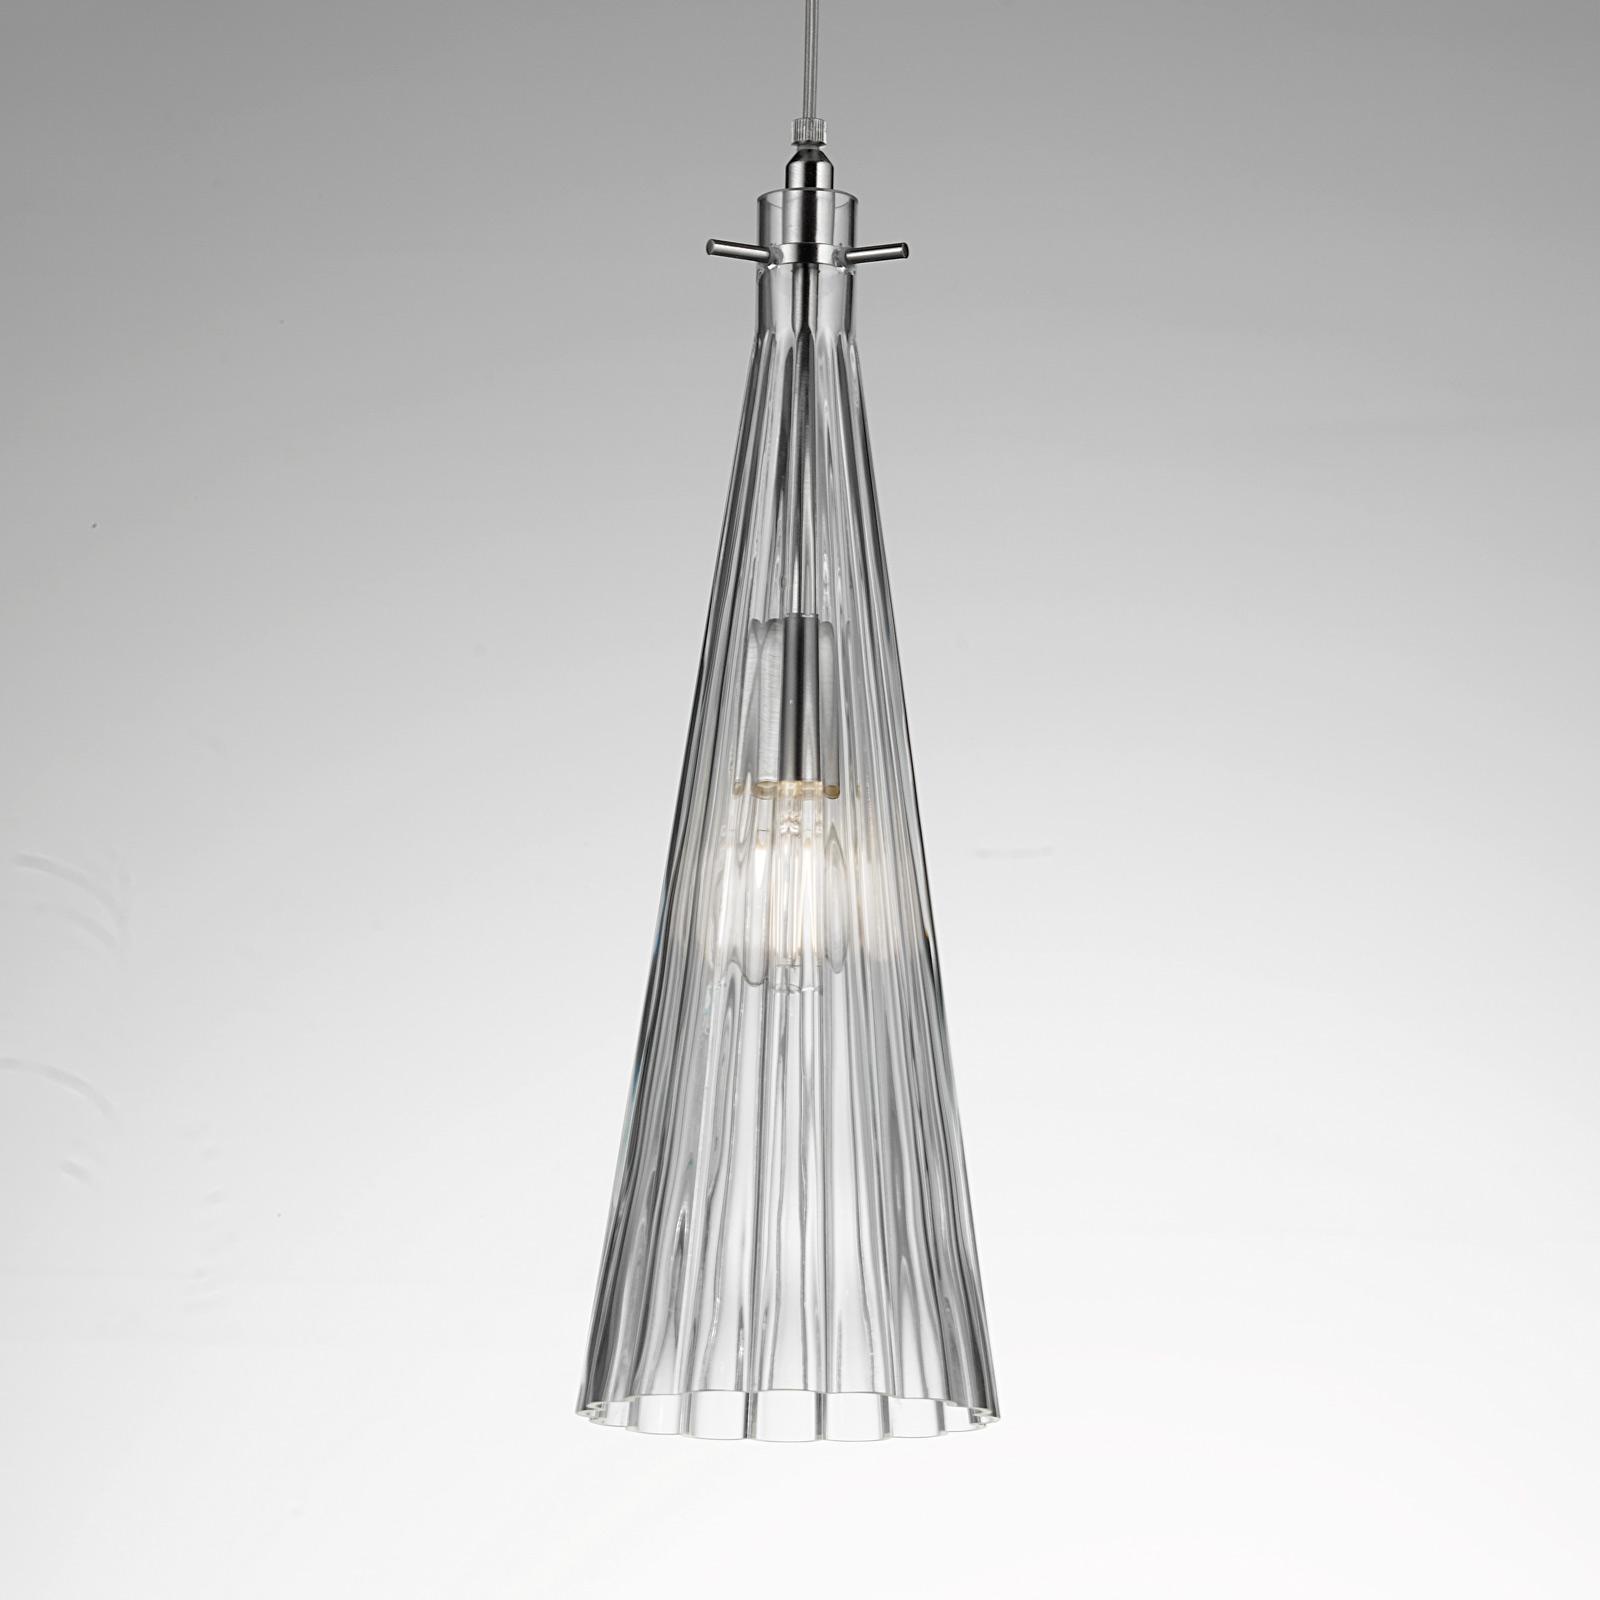 Hanglamp Costa Rica van glas, transparant